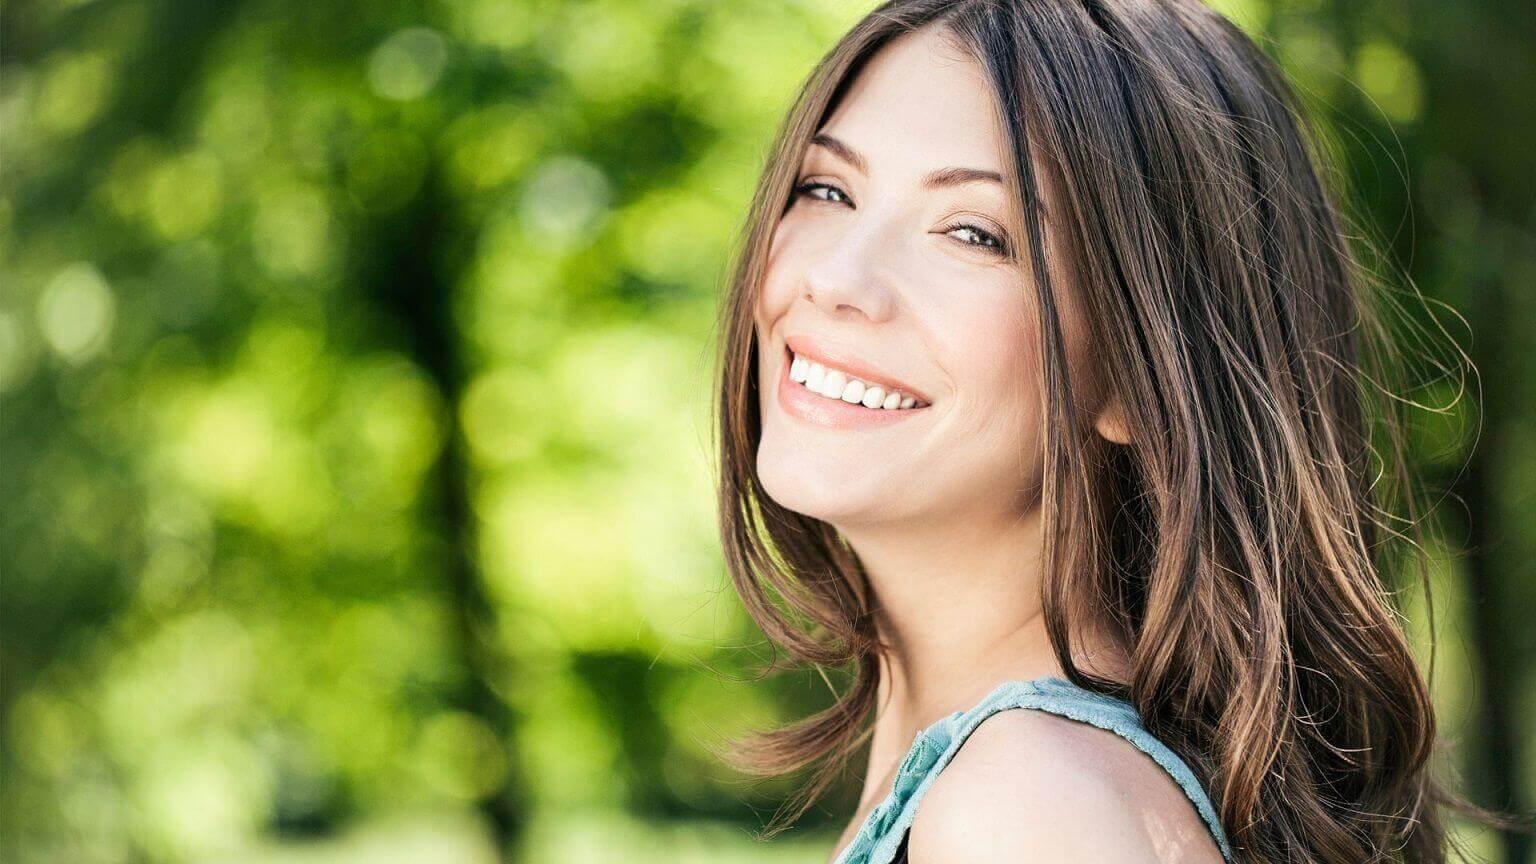 Dental-implants-Beverly-Hills